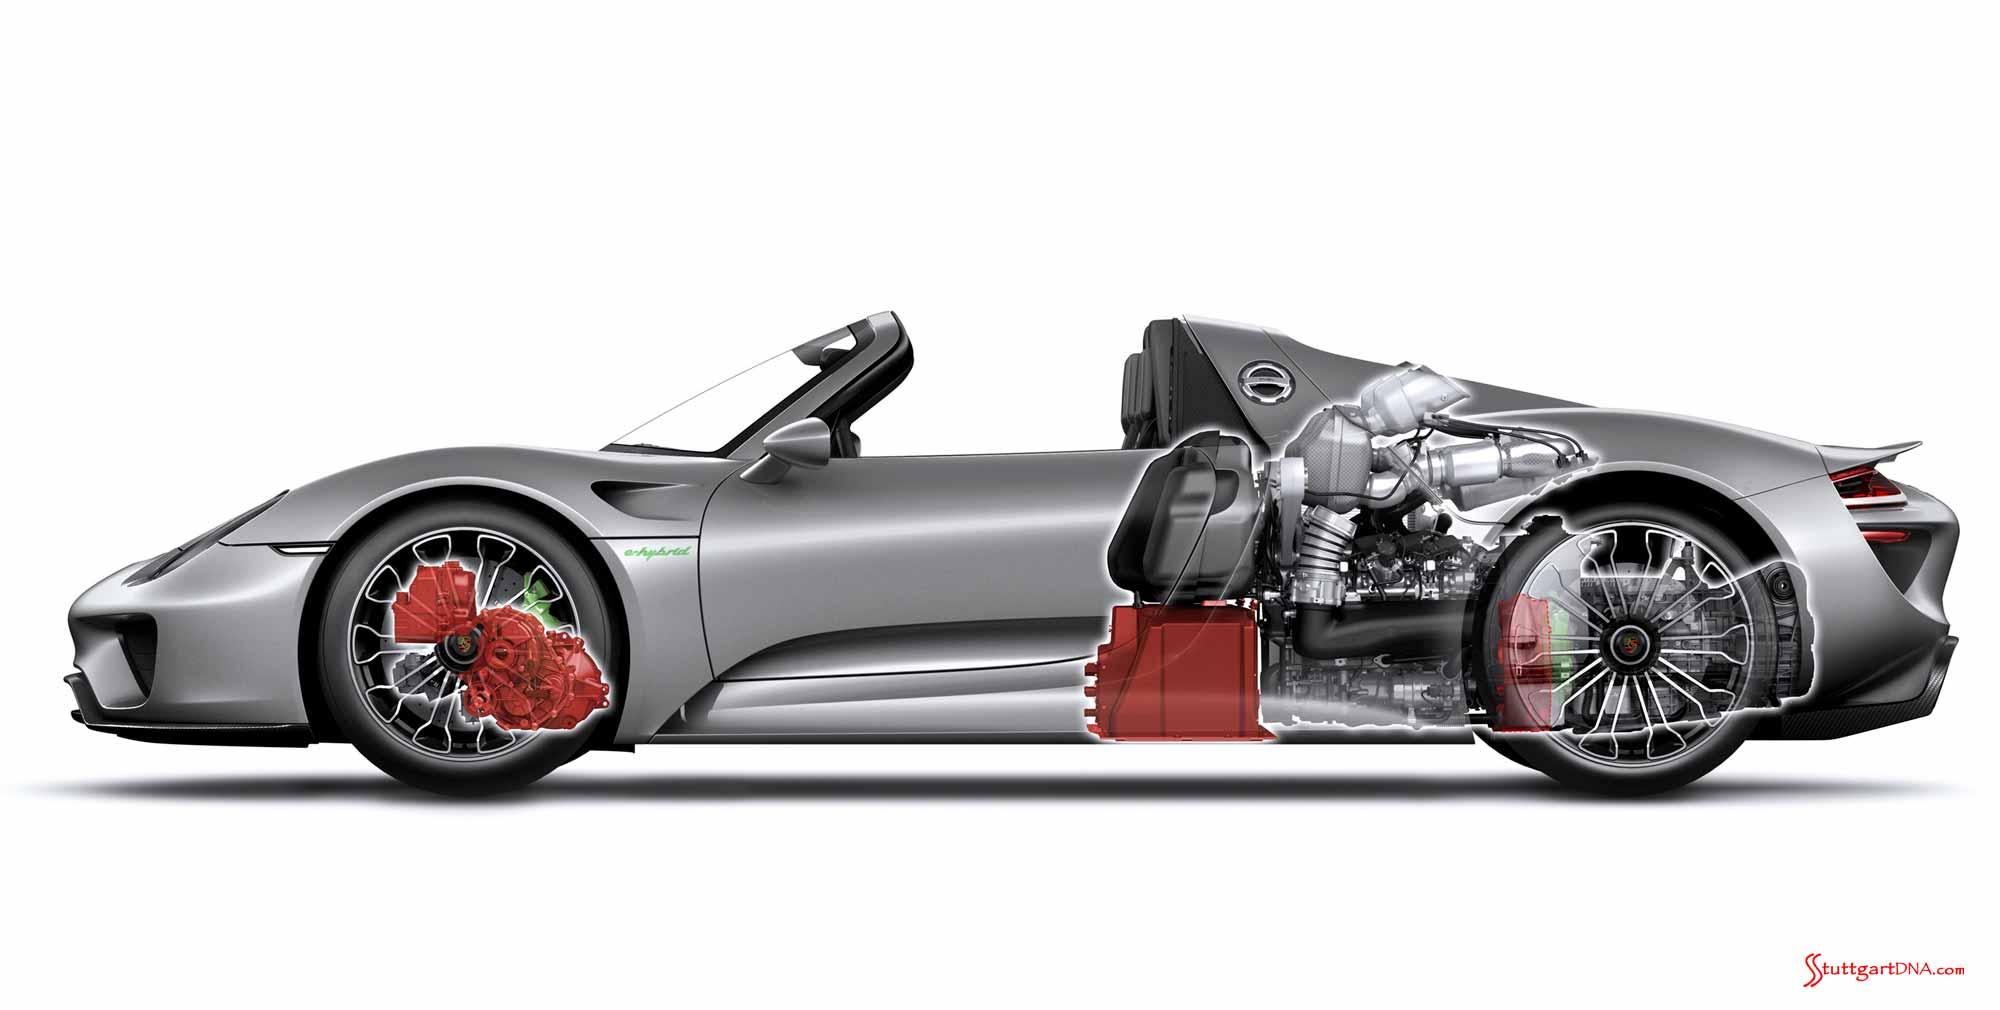 918-Spyder-left-side-skeletal-view Mesmerizing Porsche 918 Spyder London Ontario Cars Trend